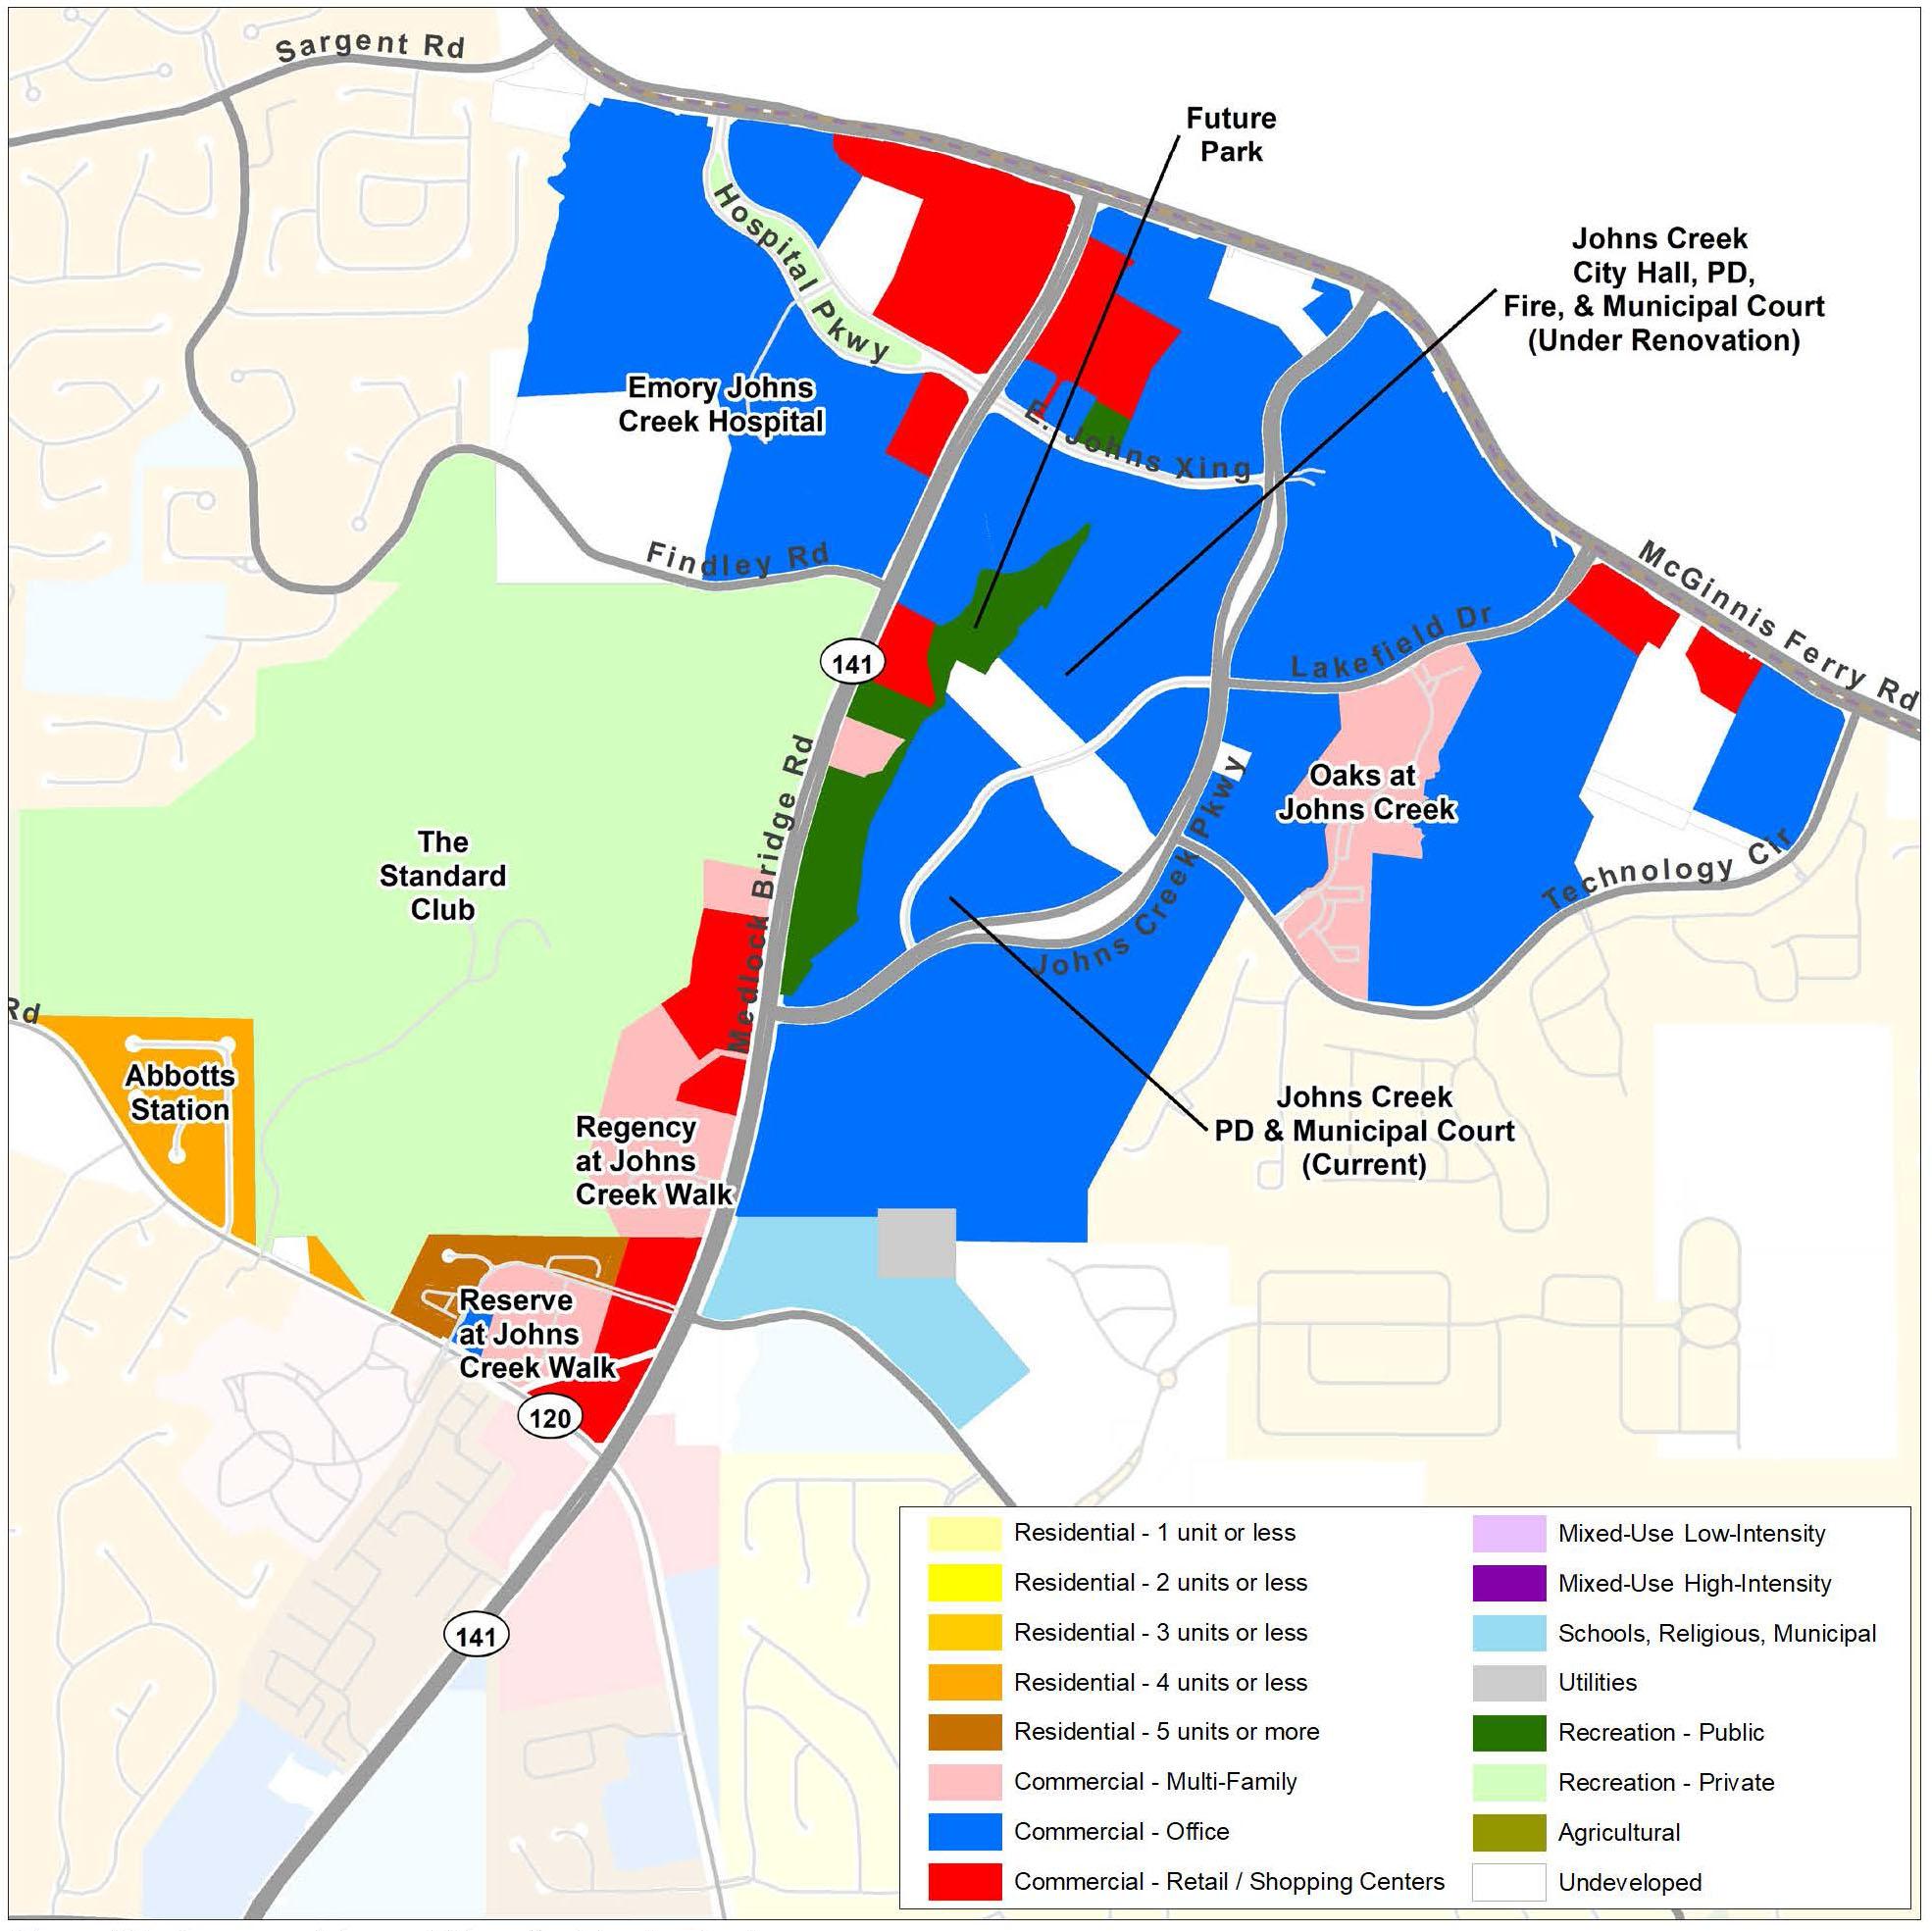 Tech Park: Current Land Use Map